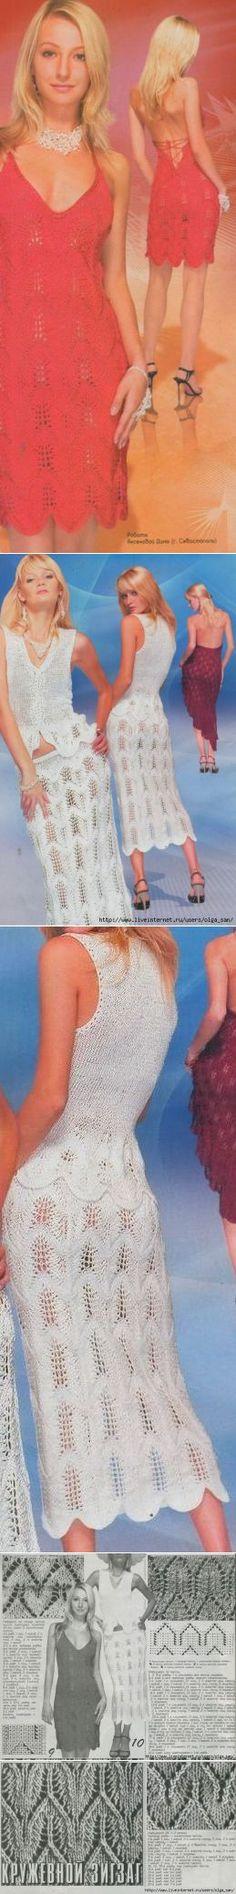 и юбка...♥ Deniz ♥.